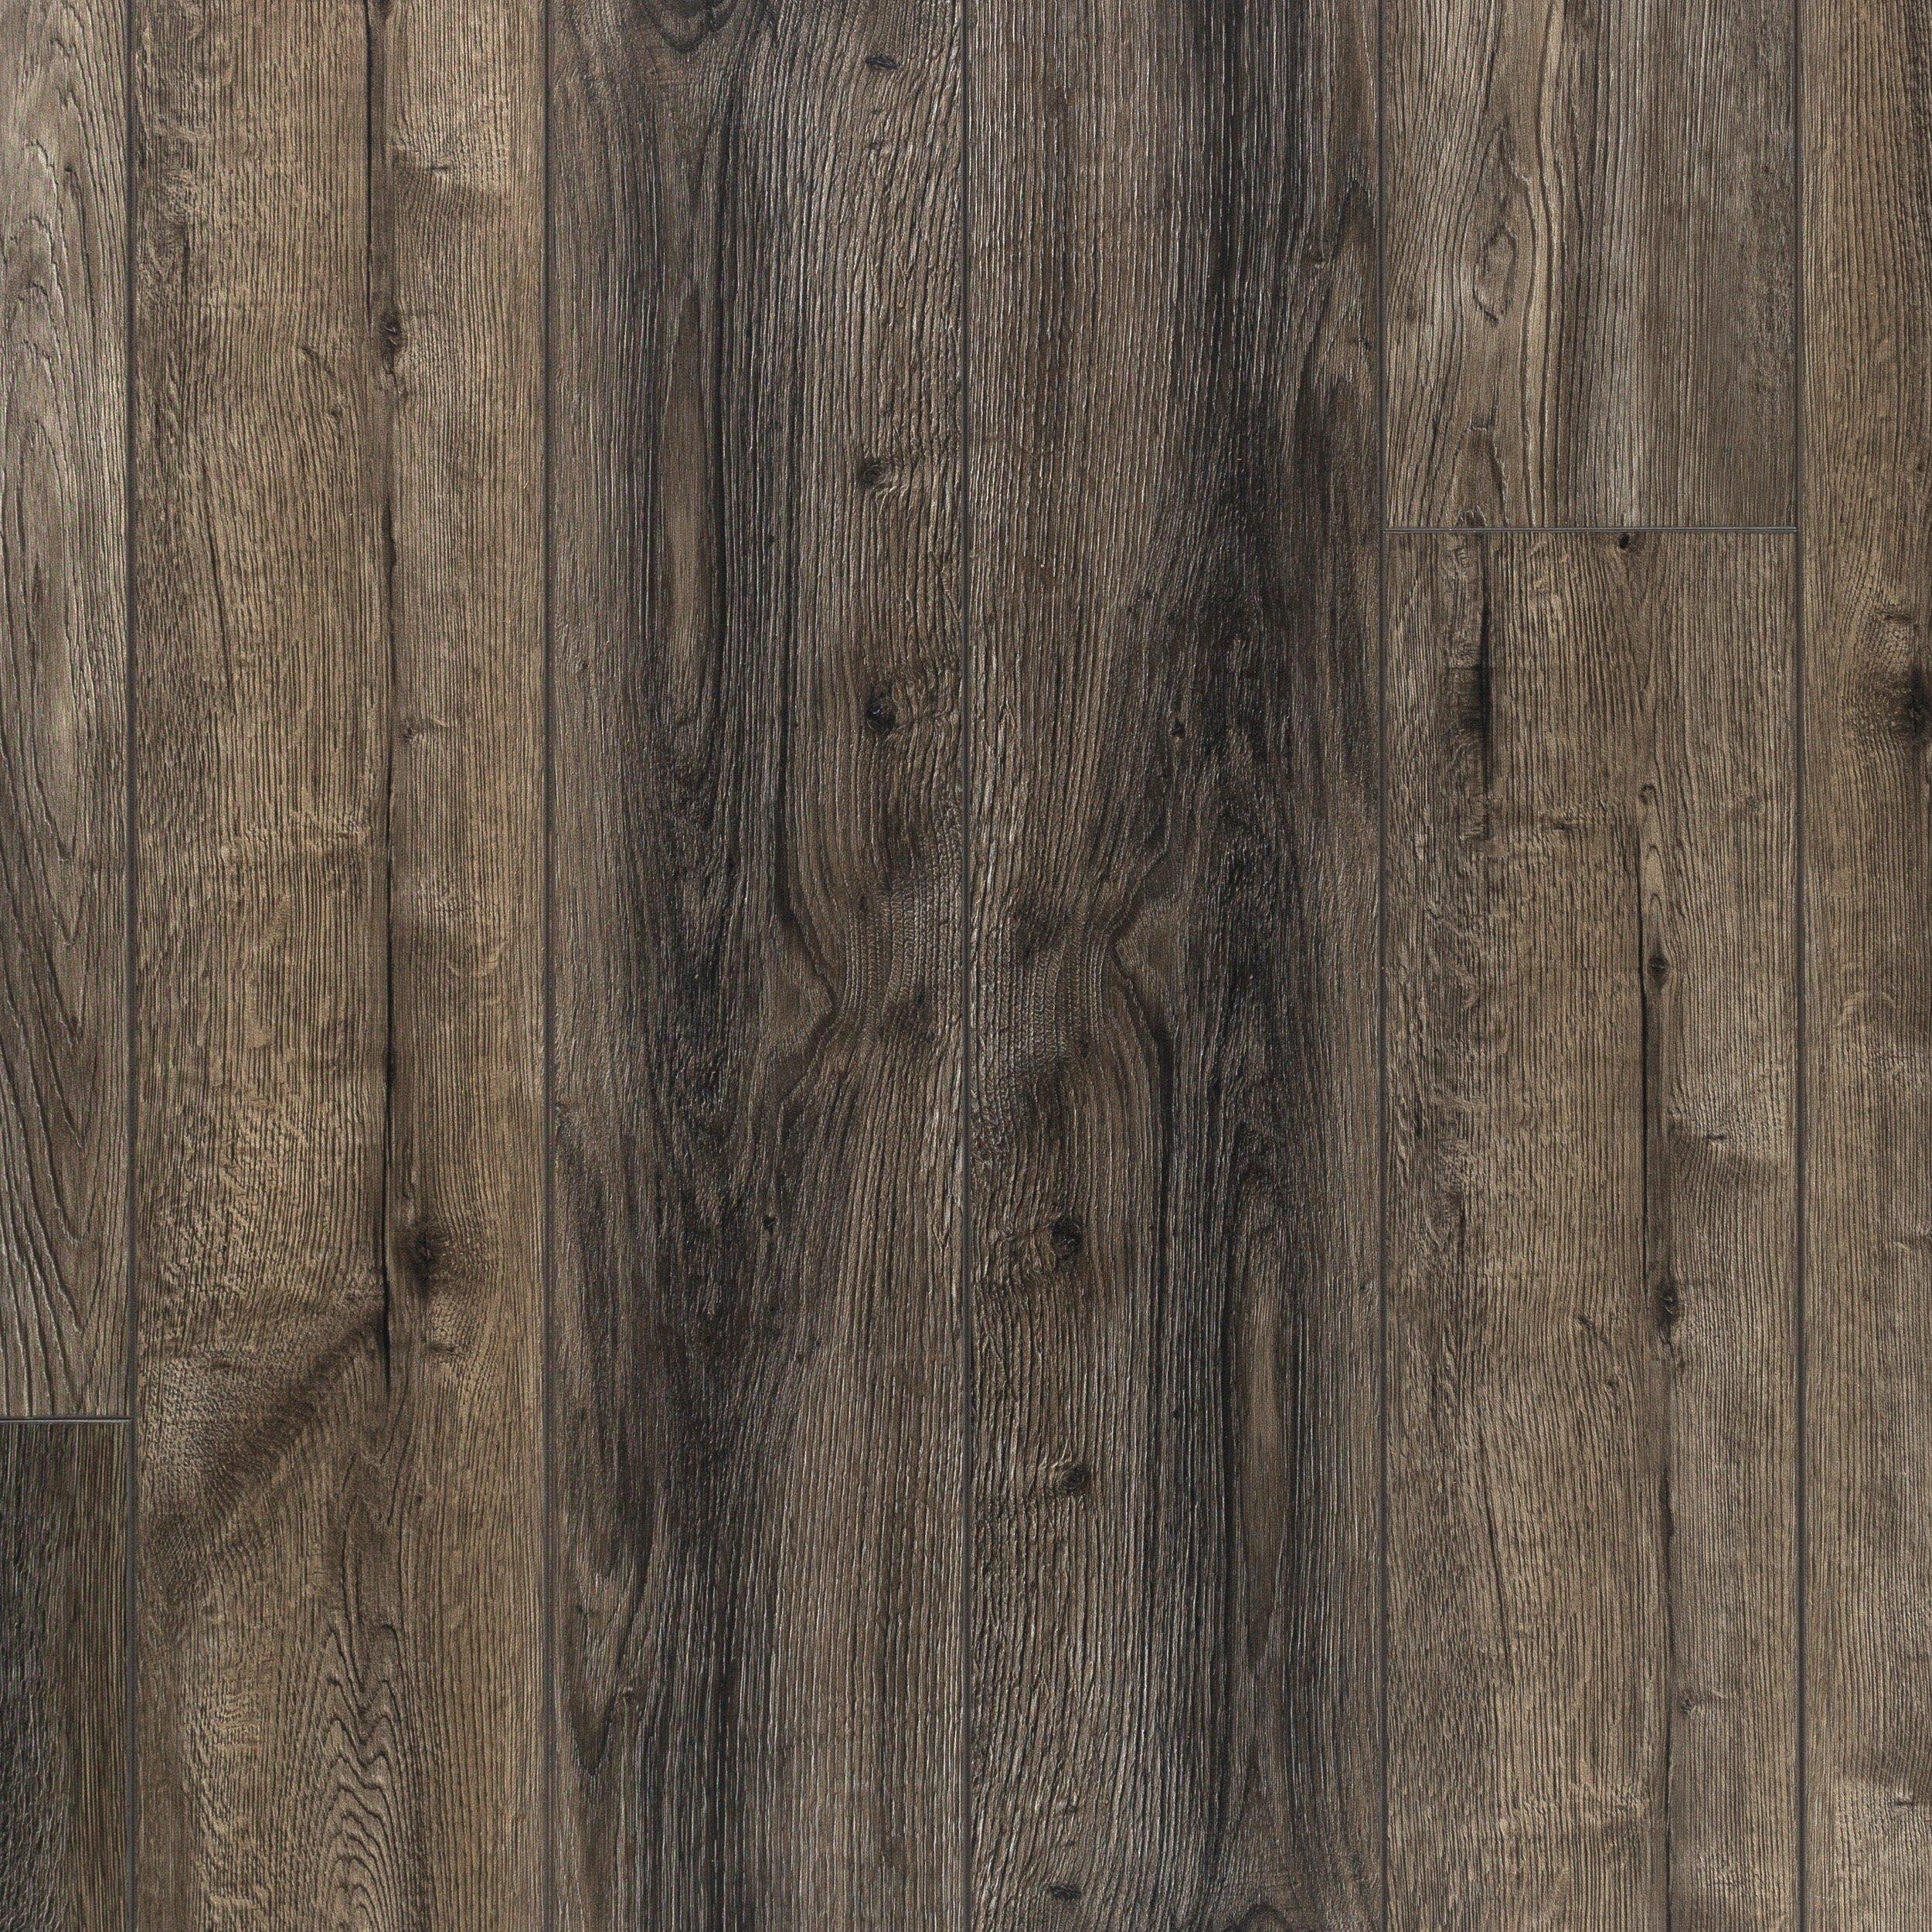 Amazing Vinyl Plank Flooring Pros And Cons Only On Interioropedia Com Luxury Vinyl Plank Vinyl Plank Flooring